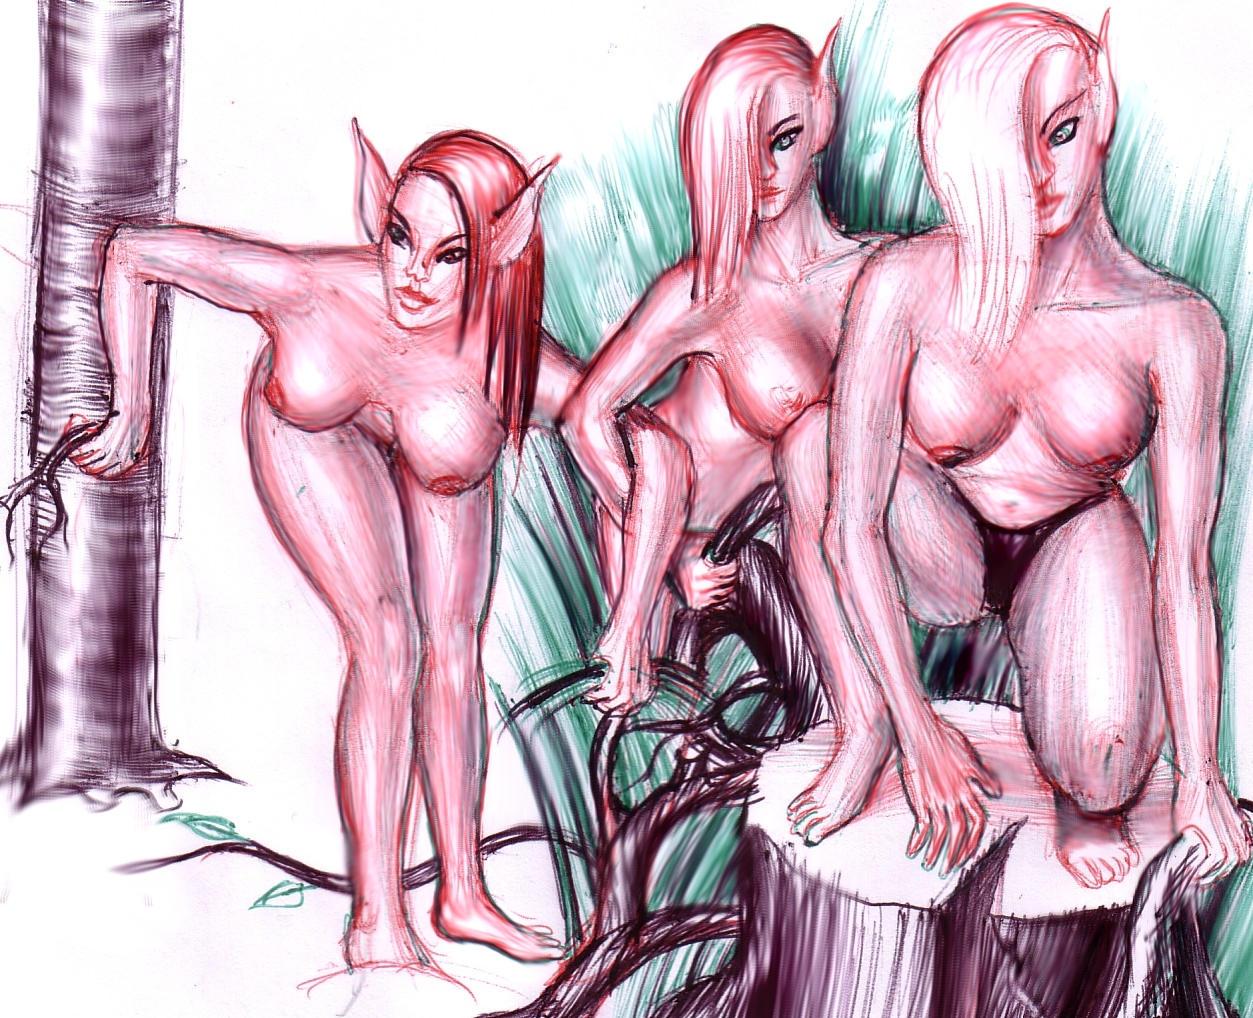 Alien women nudes hentai girlfriend